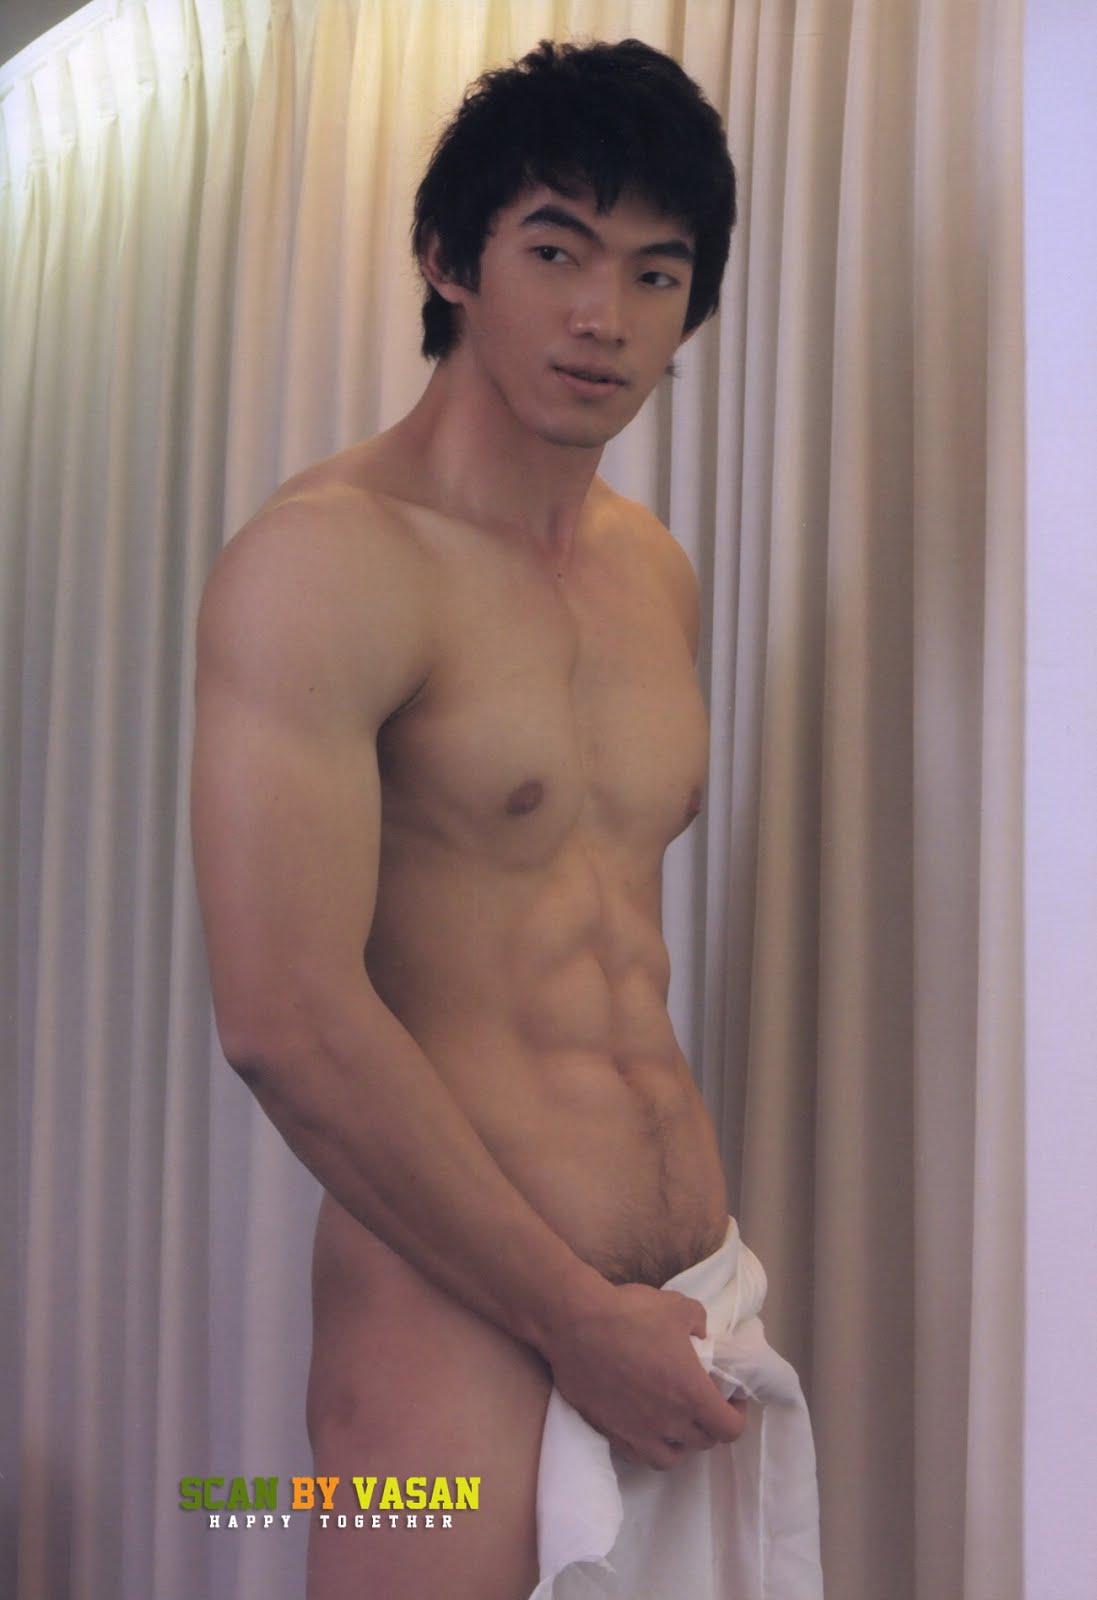 Jake Mclennen Nude Pretty hunk japaneseLeaked.jp japanese nude pussy